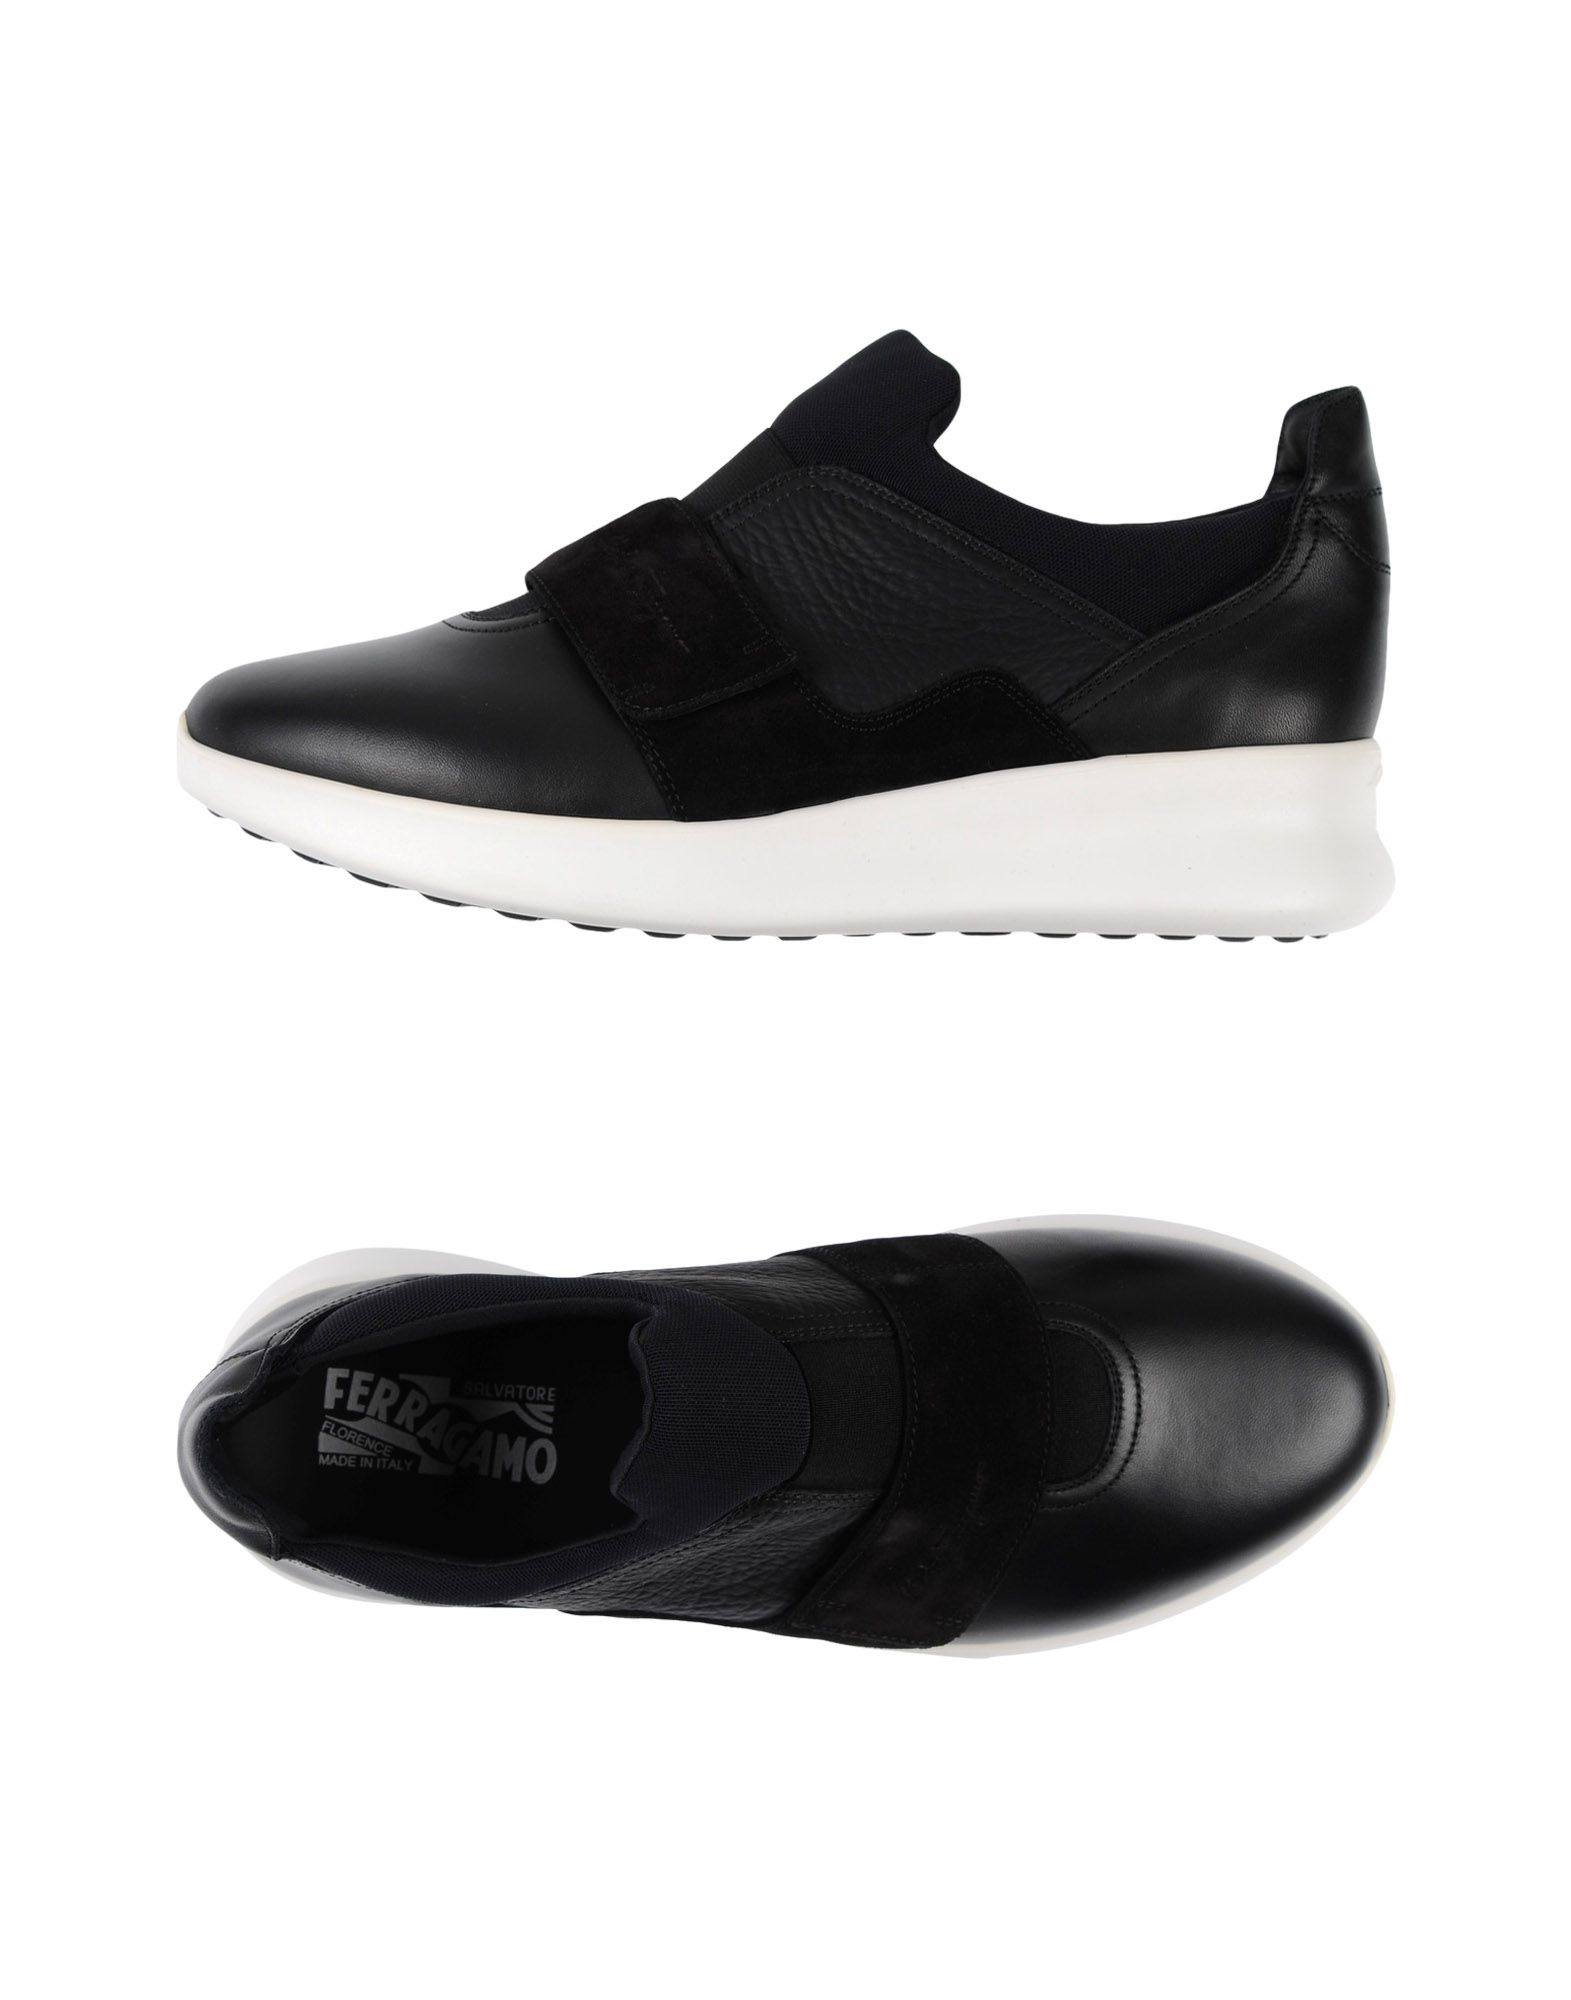 Salvatore Ferragamo Gute Sneakers Herren  11463794CR Gute Ferragamo Qualität beliebte Schuhe 20d5e4